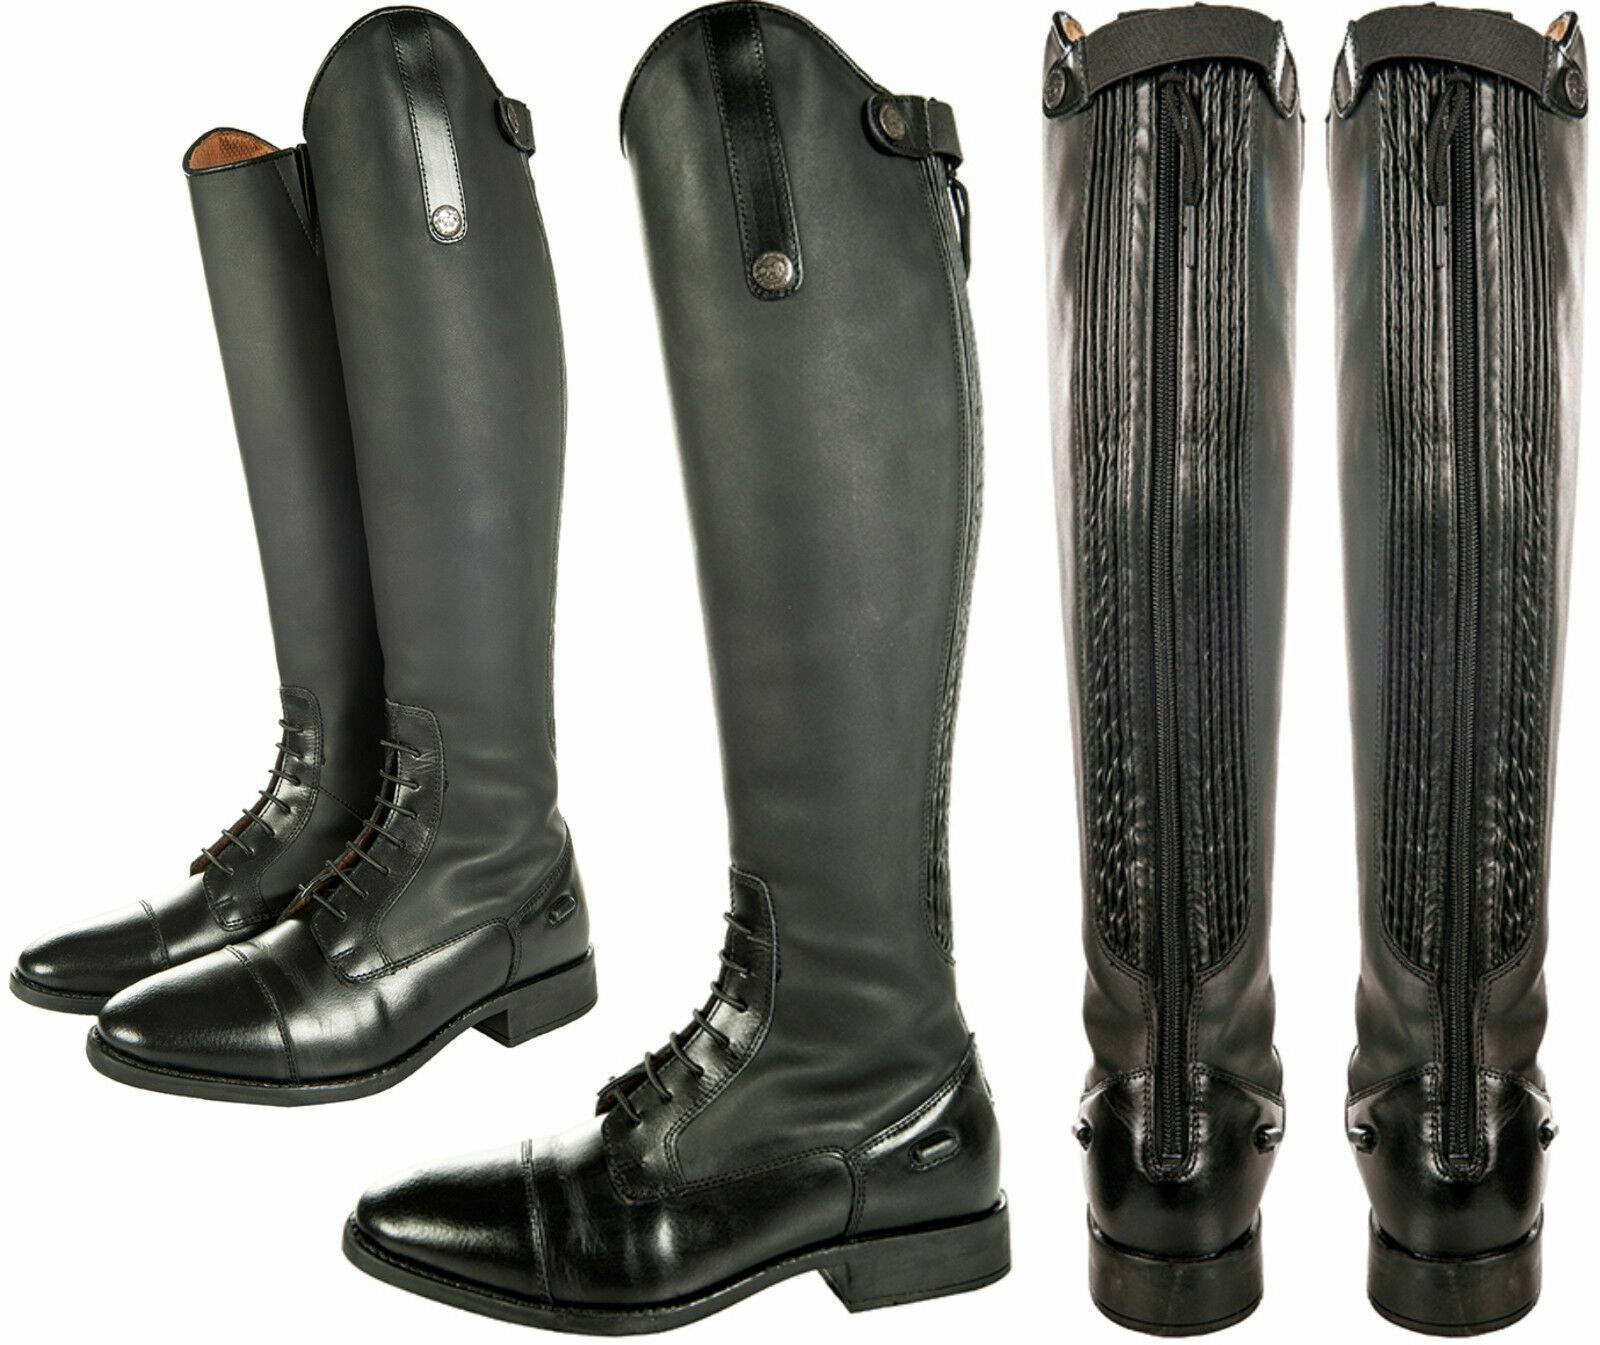 HKM Riding Boots  -sevilla  ldren Standard Wide  a lot of surprises